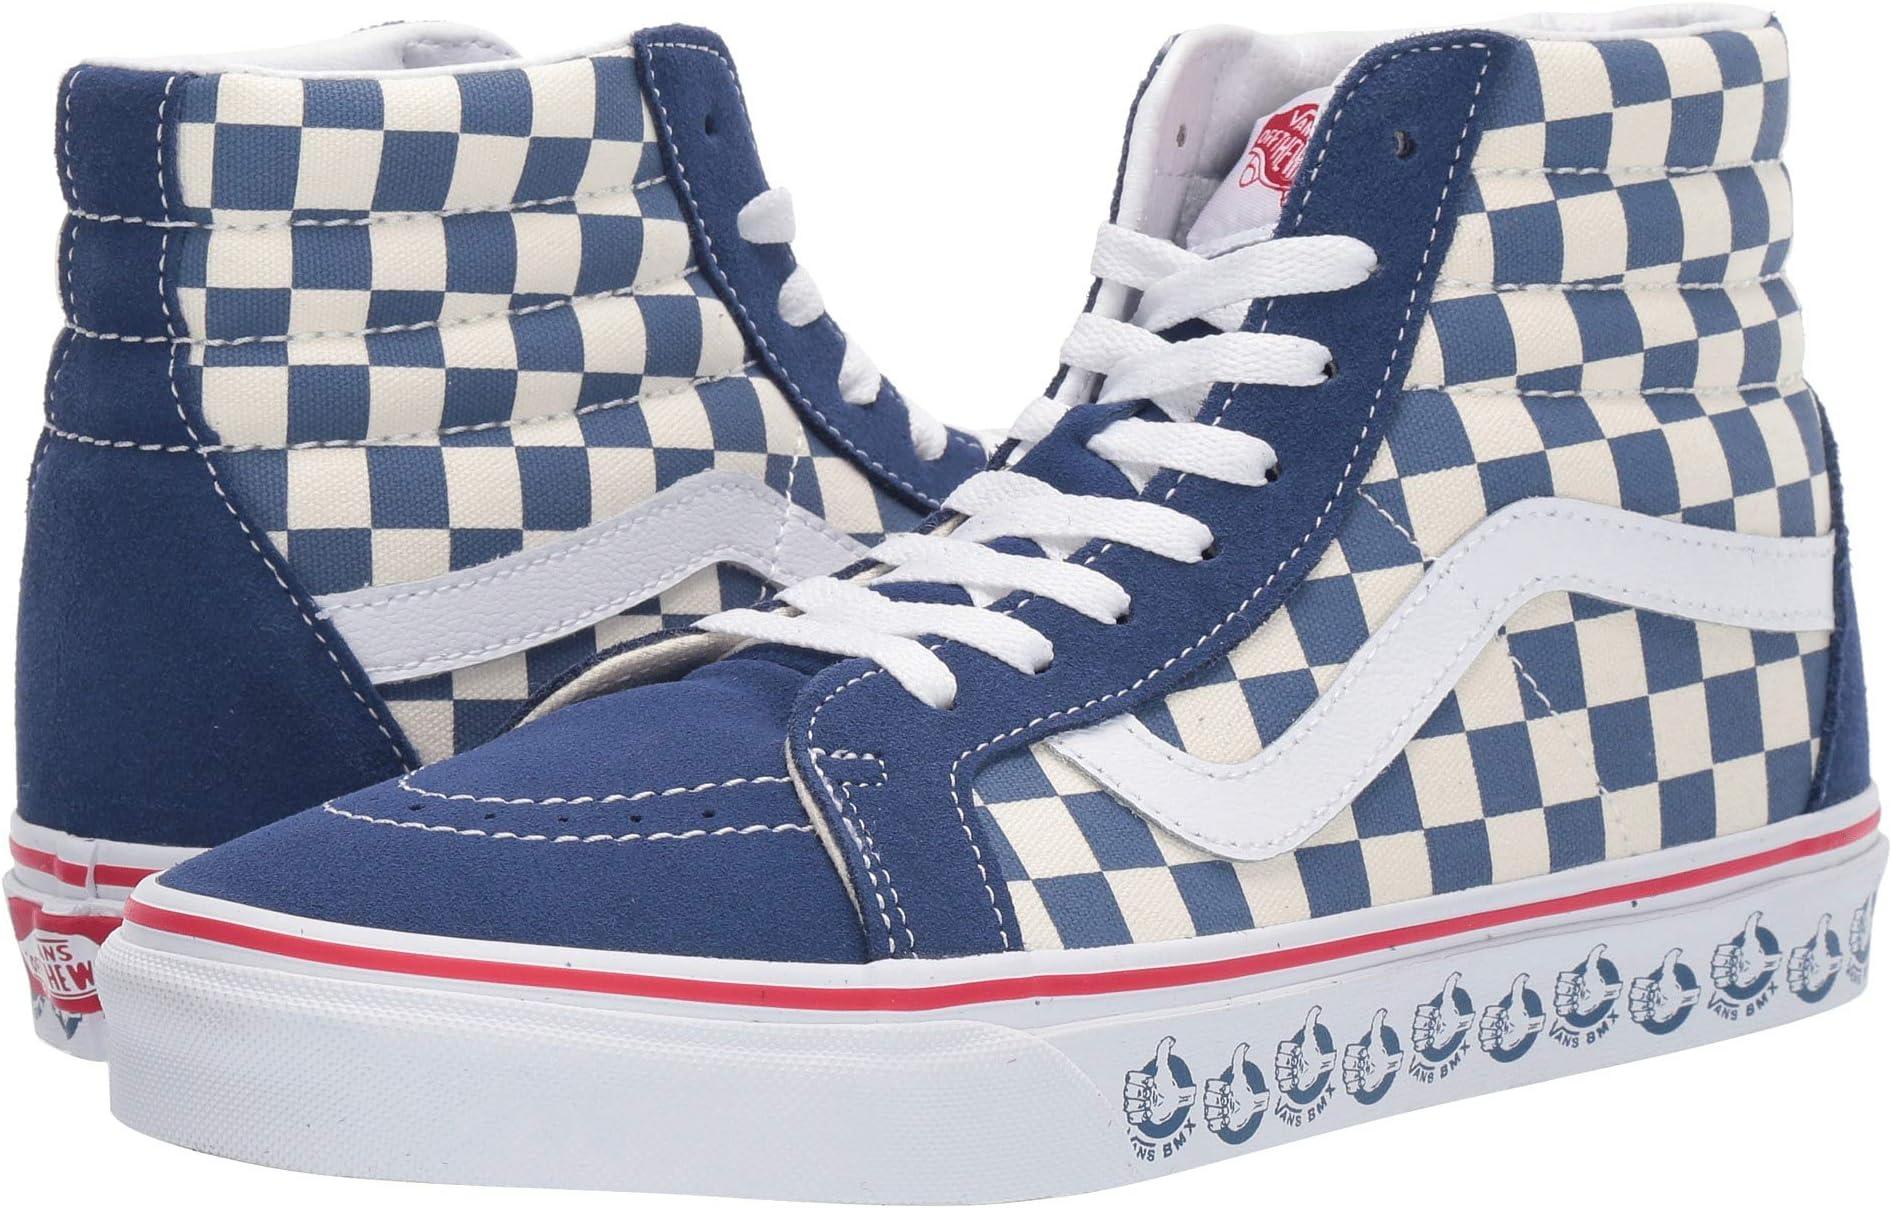 premium selection 1267b 97ee5 Shoes, Shipped FREE   Zappos.com